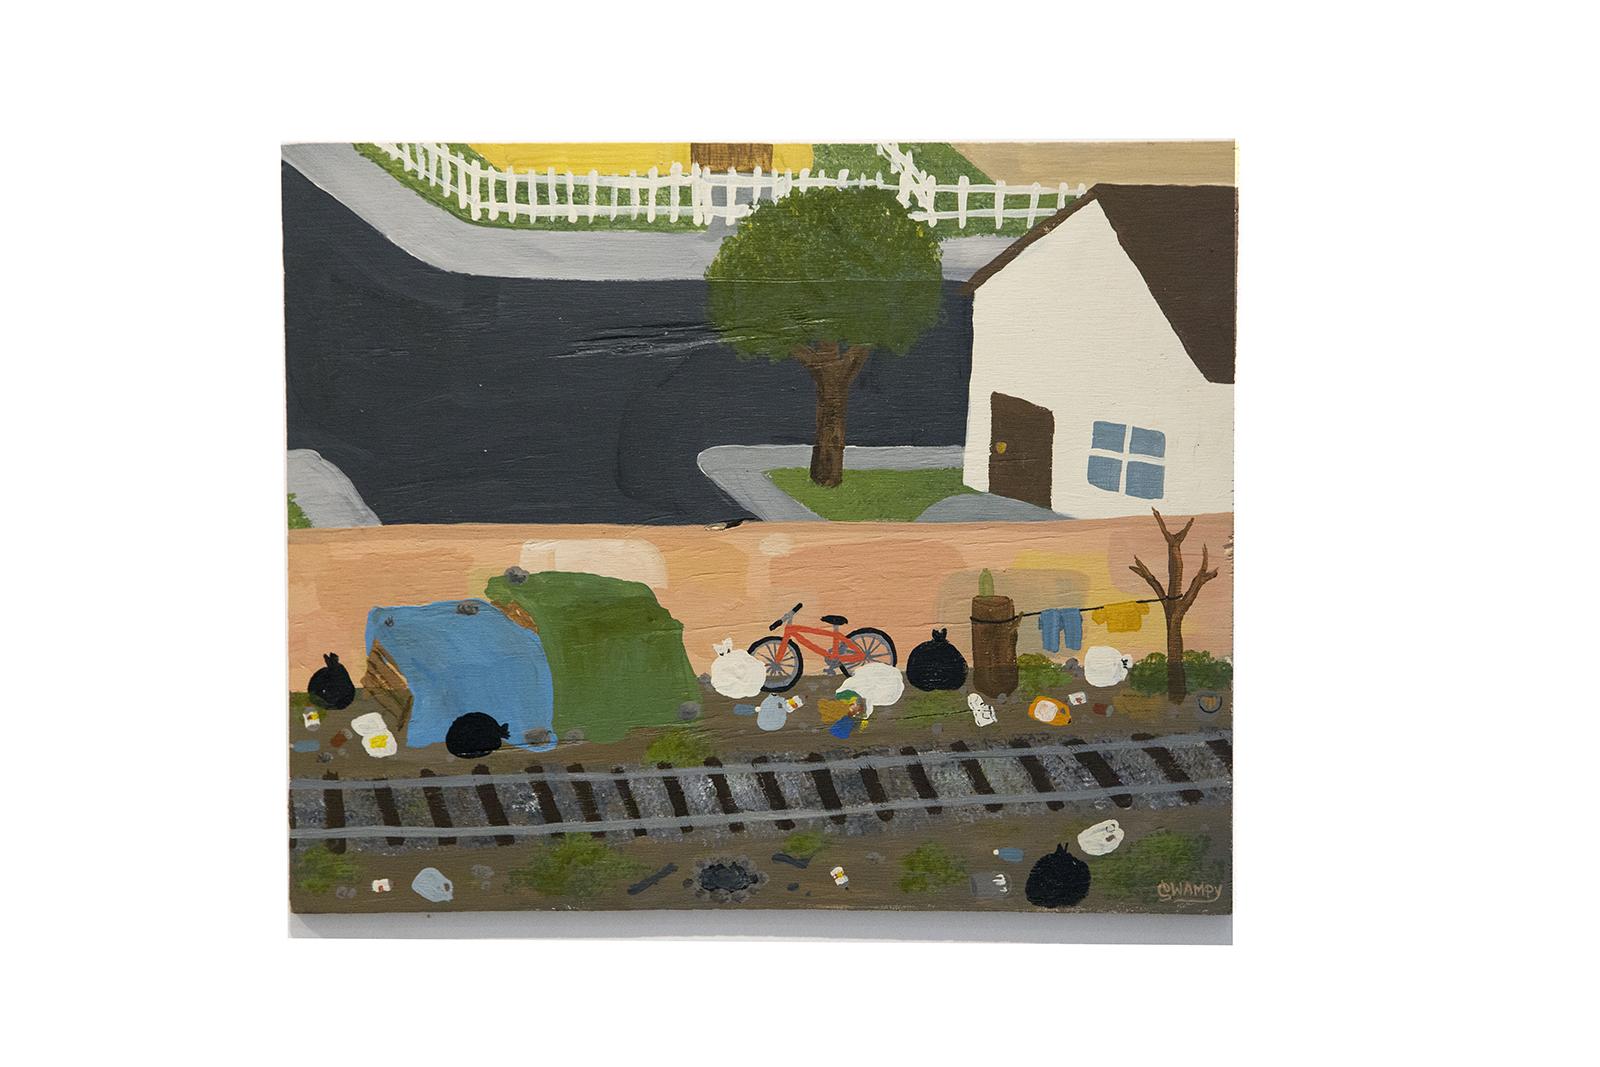 Swampy graffiti artist painting